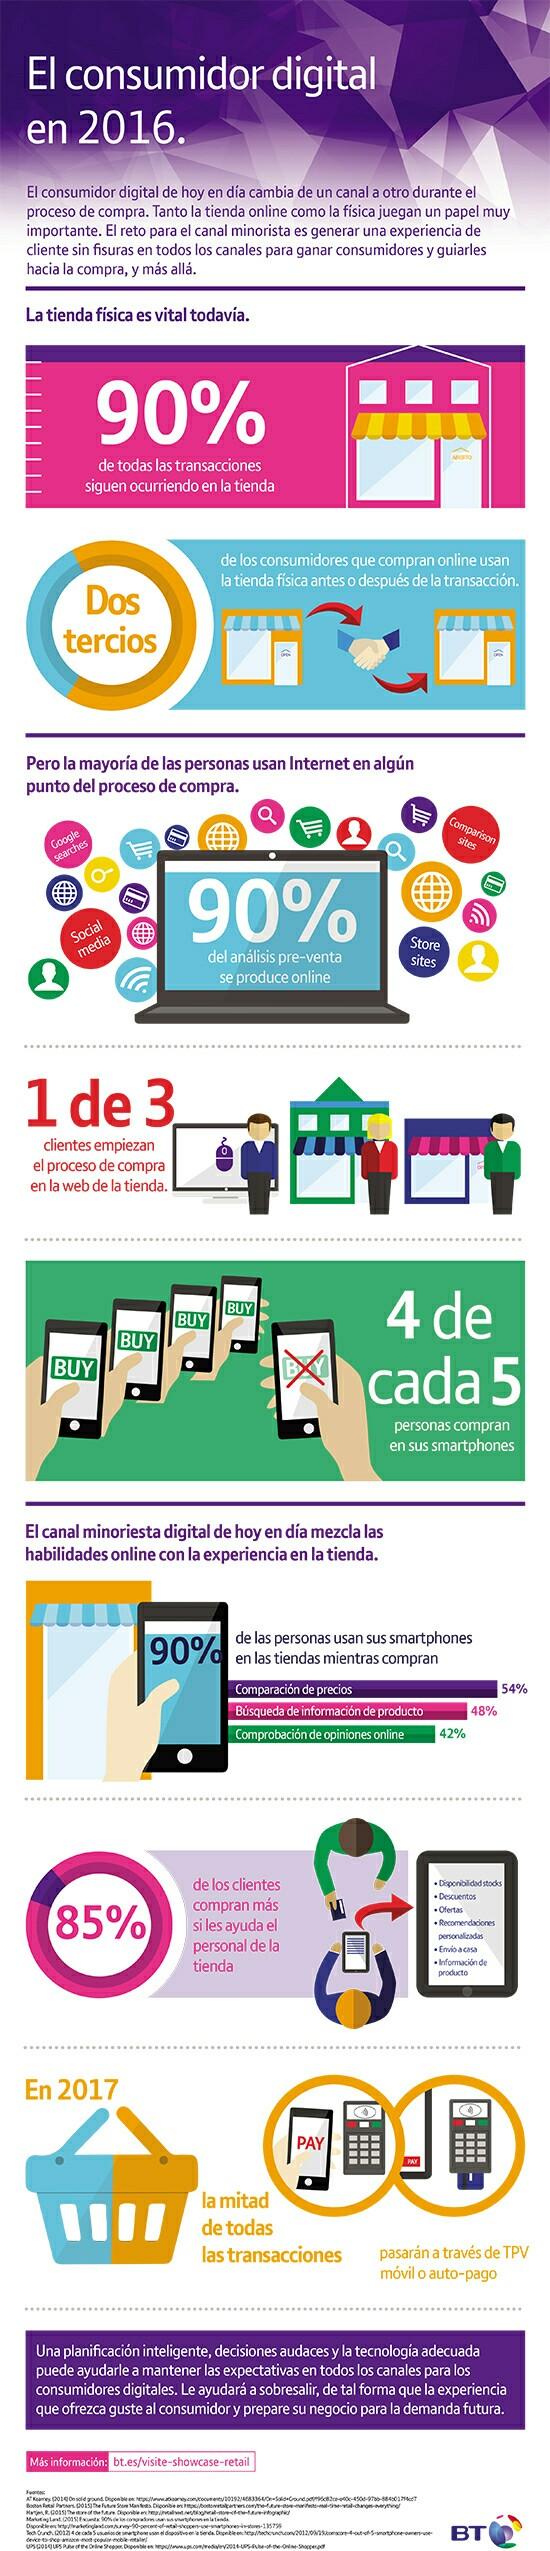 El consumidor digital en 2016... SocialMediaOP Marketing